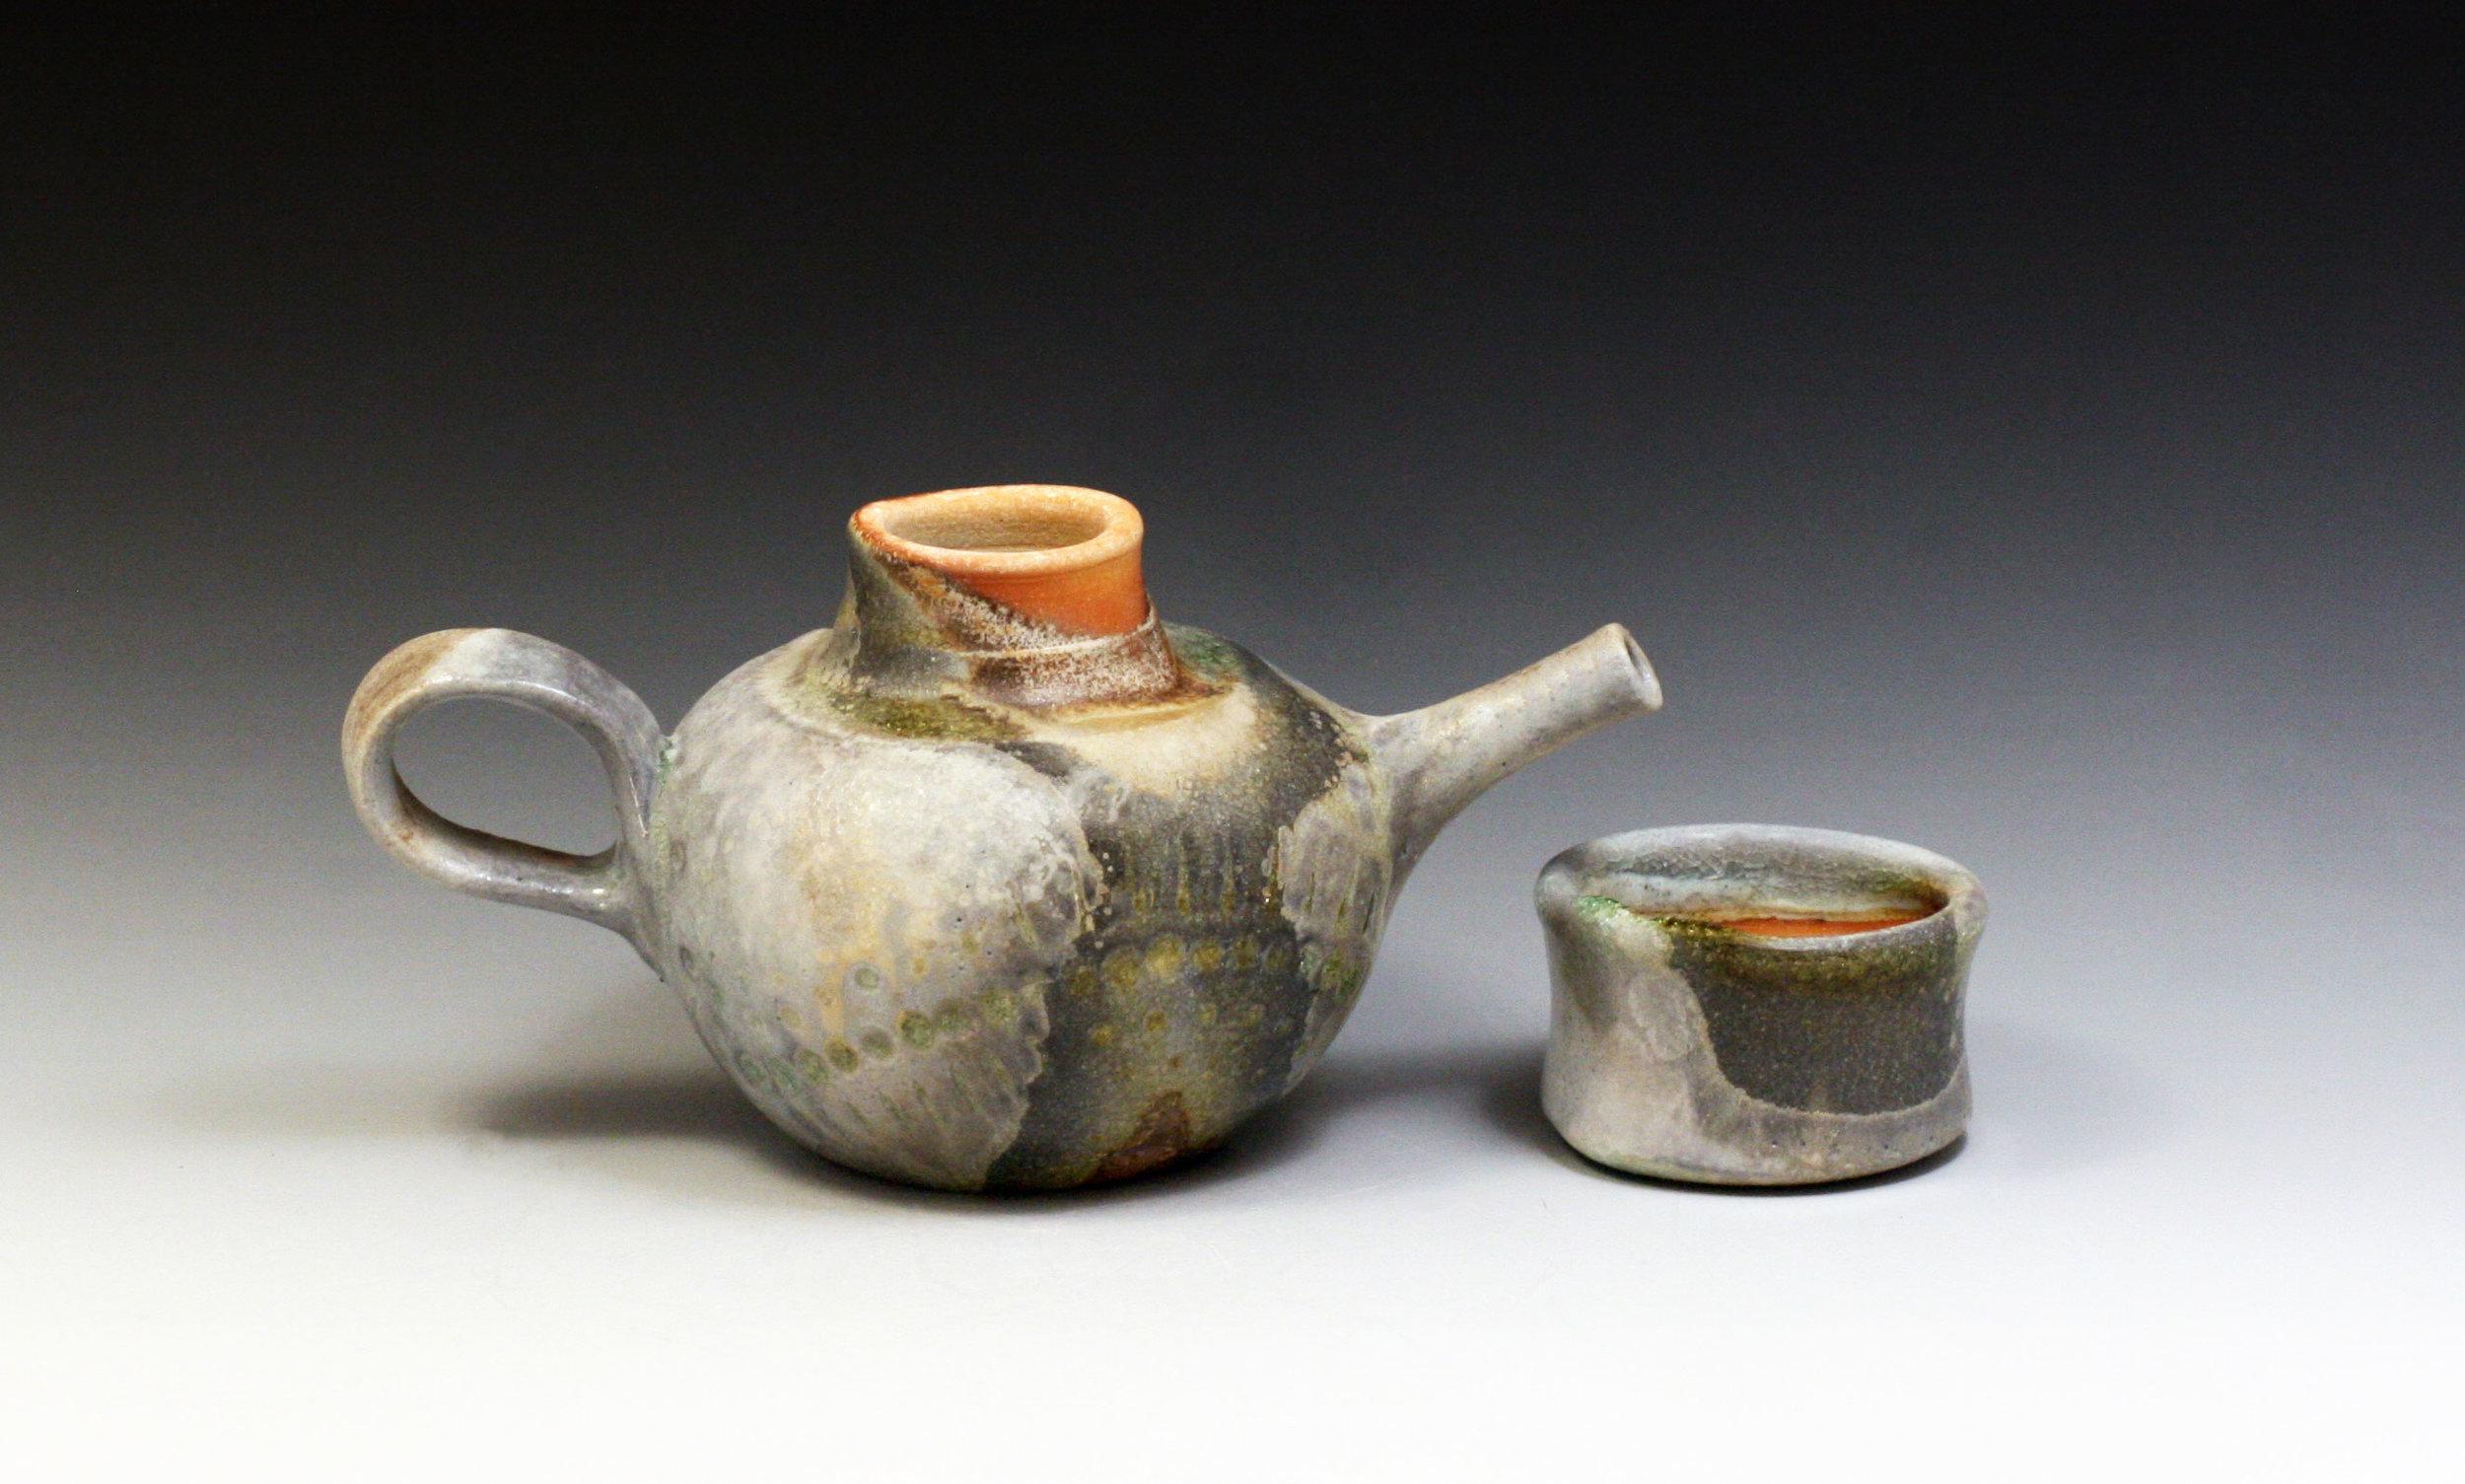 Teapot-16c-web.jpg